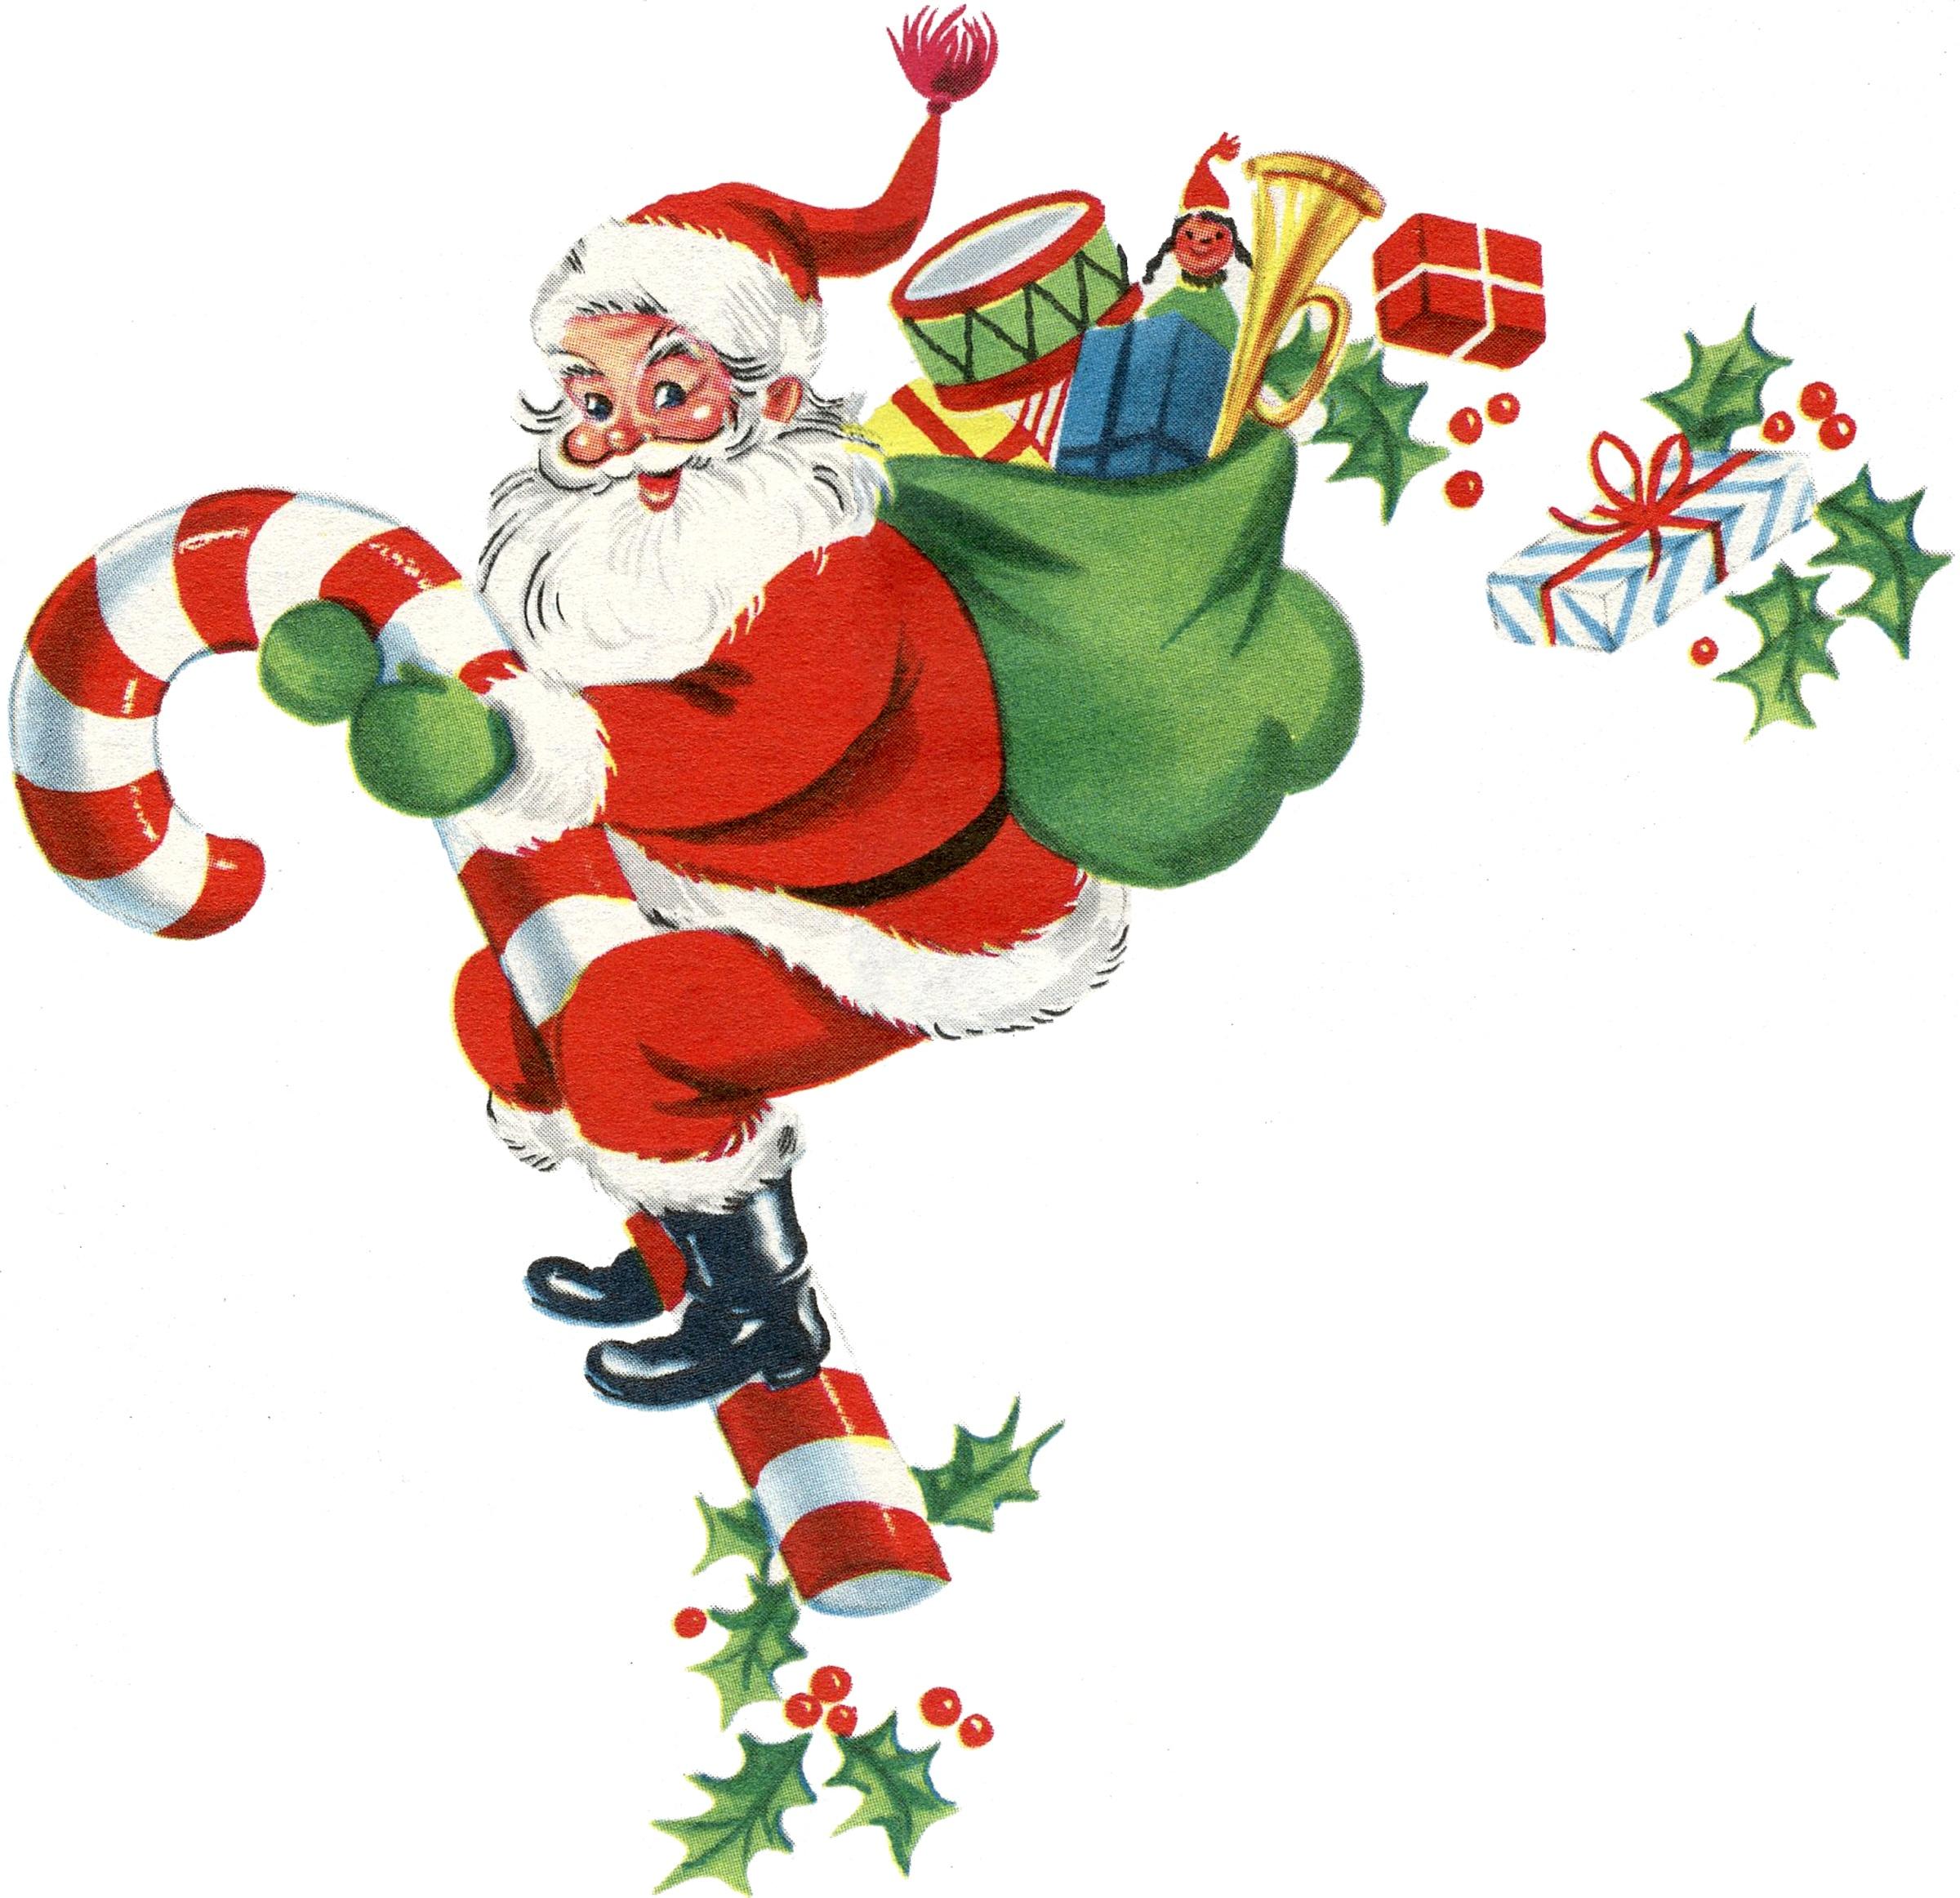 Free Vintage Clip Art - Santa, Santa, Santa! - The Graphics Fairy - Free Printable Vintage Christmas Clip Art